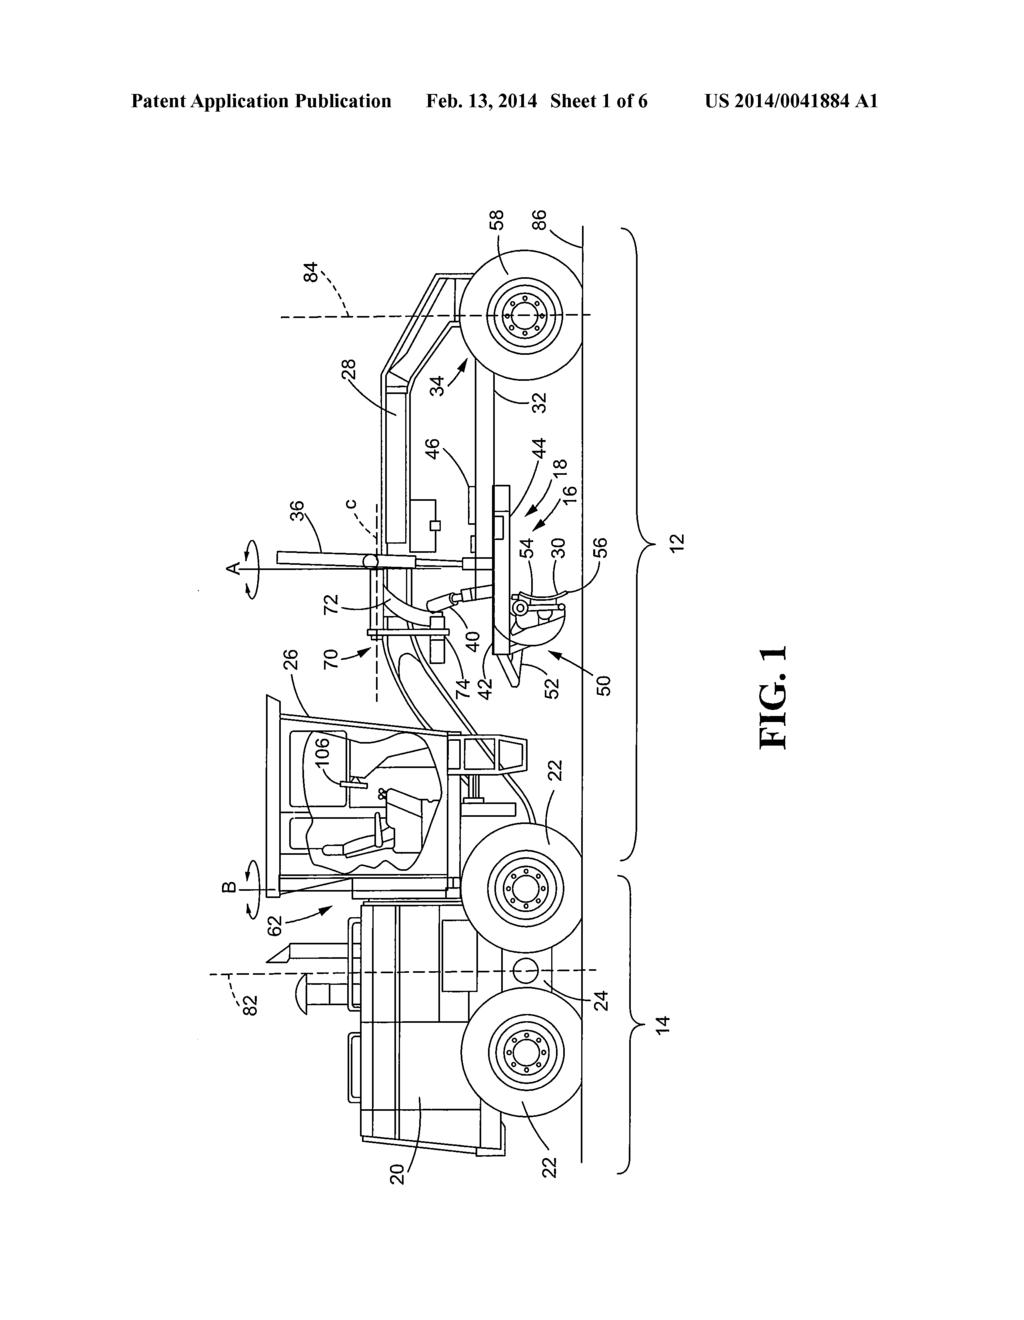 Niedlich Diagramm Automotor Fotos - Schaltplan Serie Circuit ...